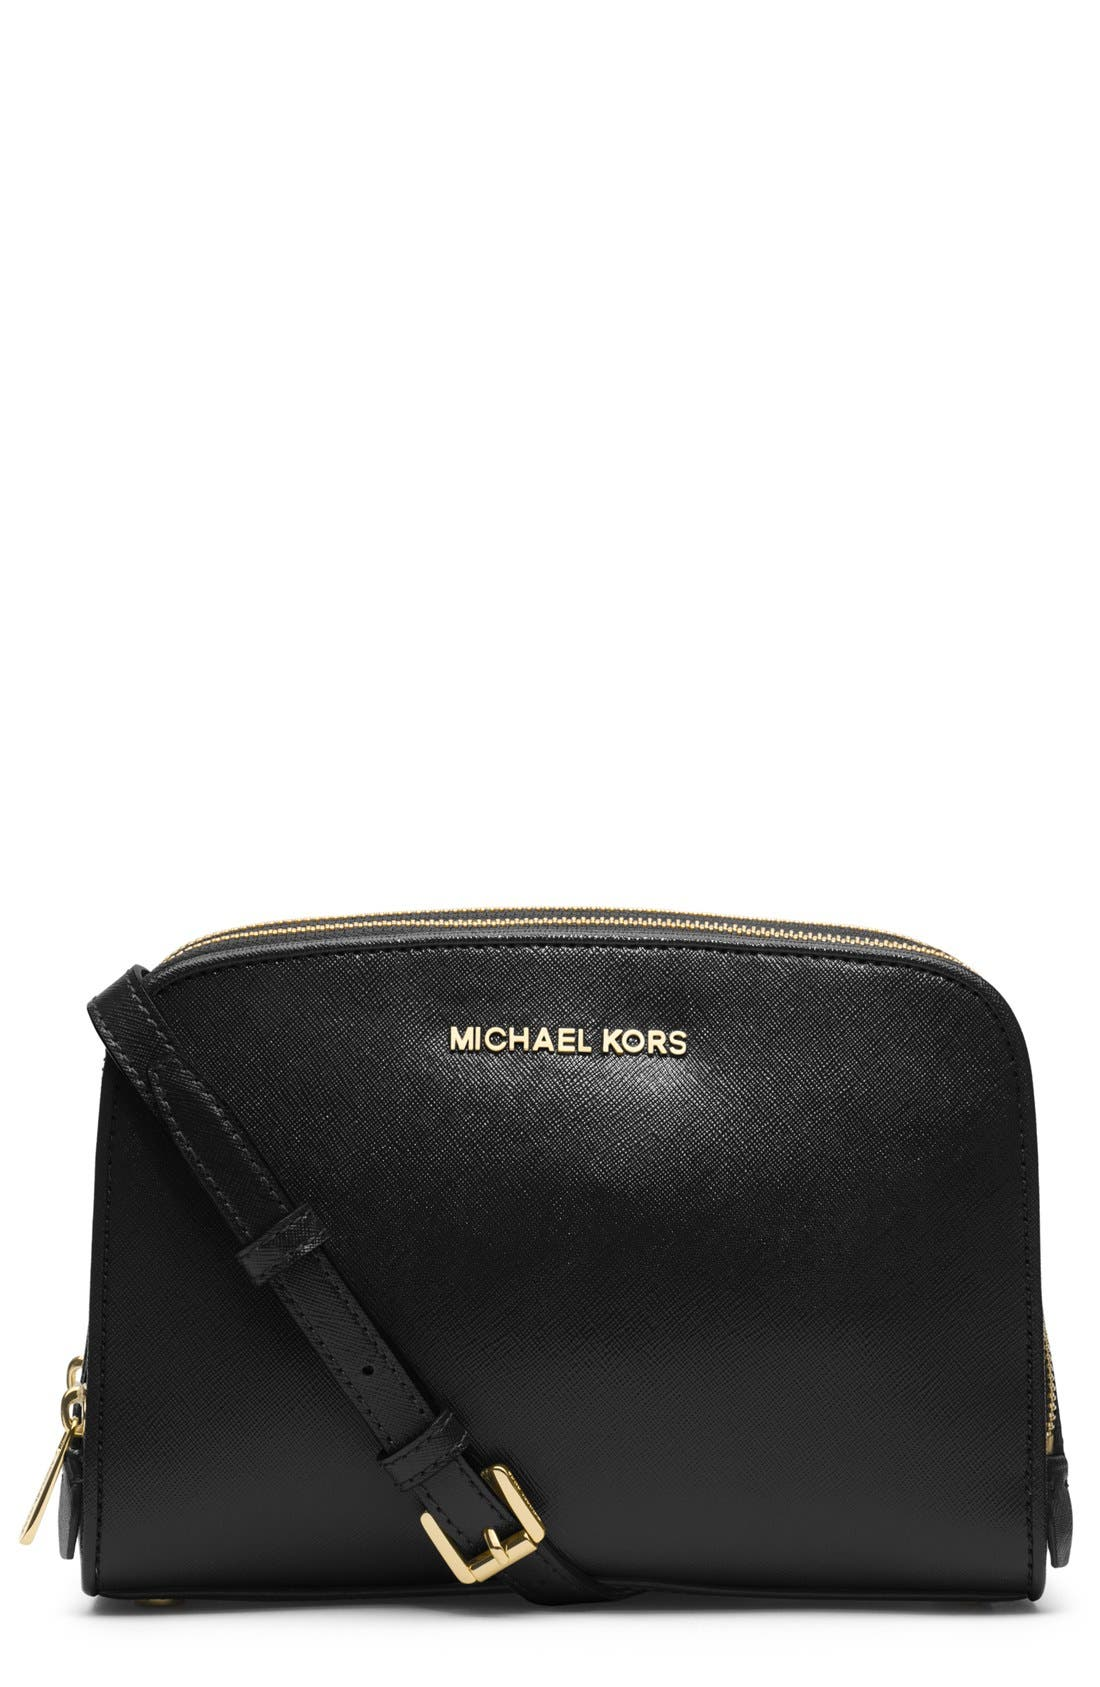 baab43fc9939e ... real michael michael kors medium reese saffiano leather messenger bag  nordstrom 720aa 02b3a